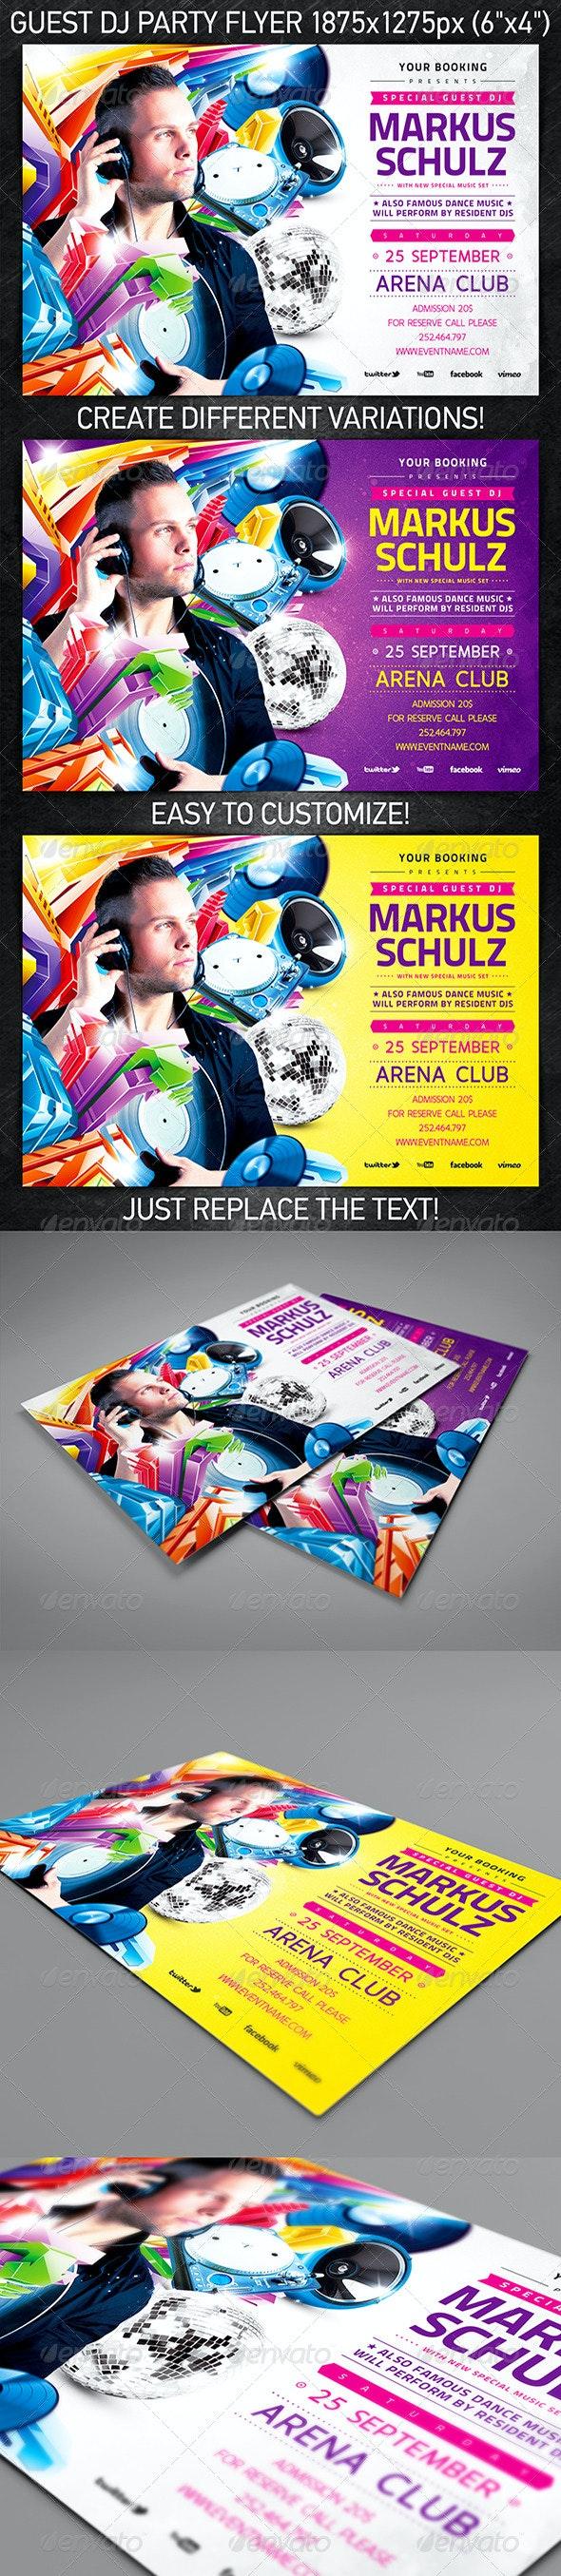 Guest DJ Party Flyer Vol.2 - Clubs & Parties Events